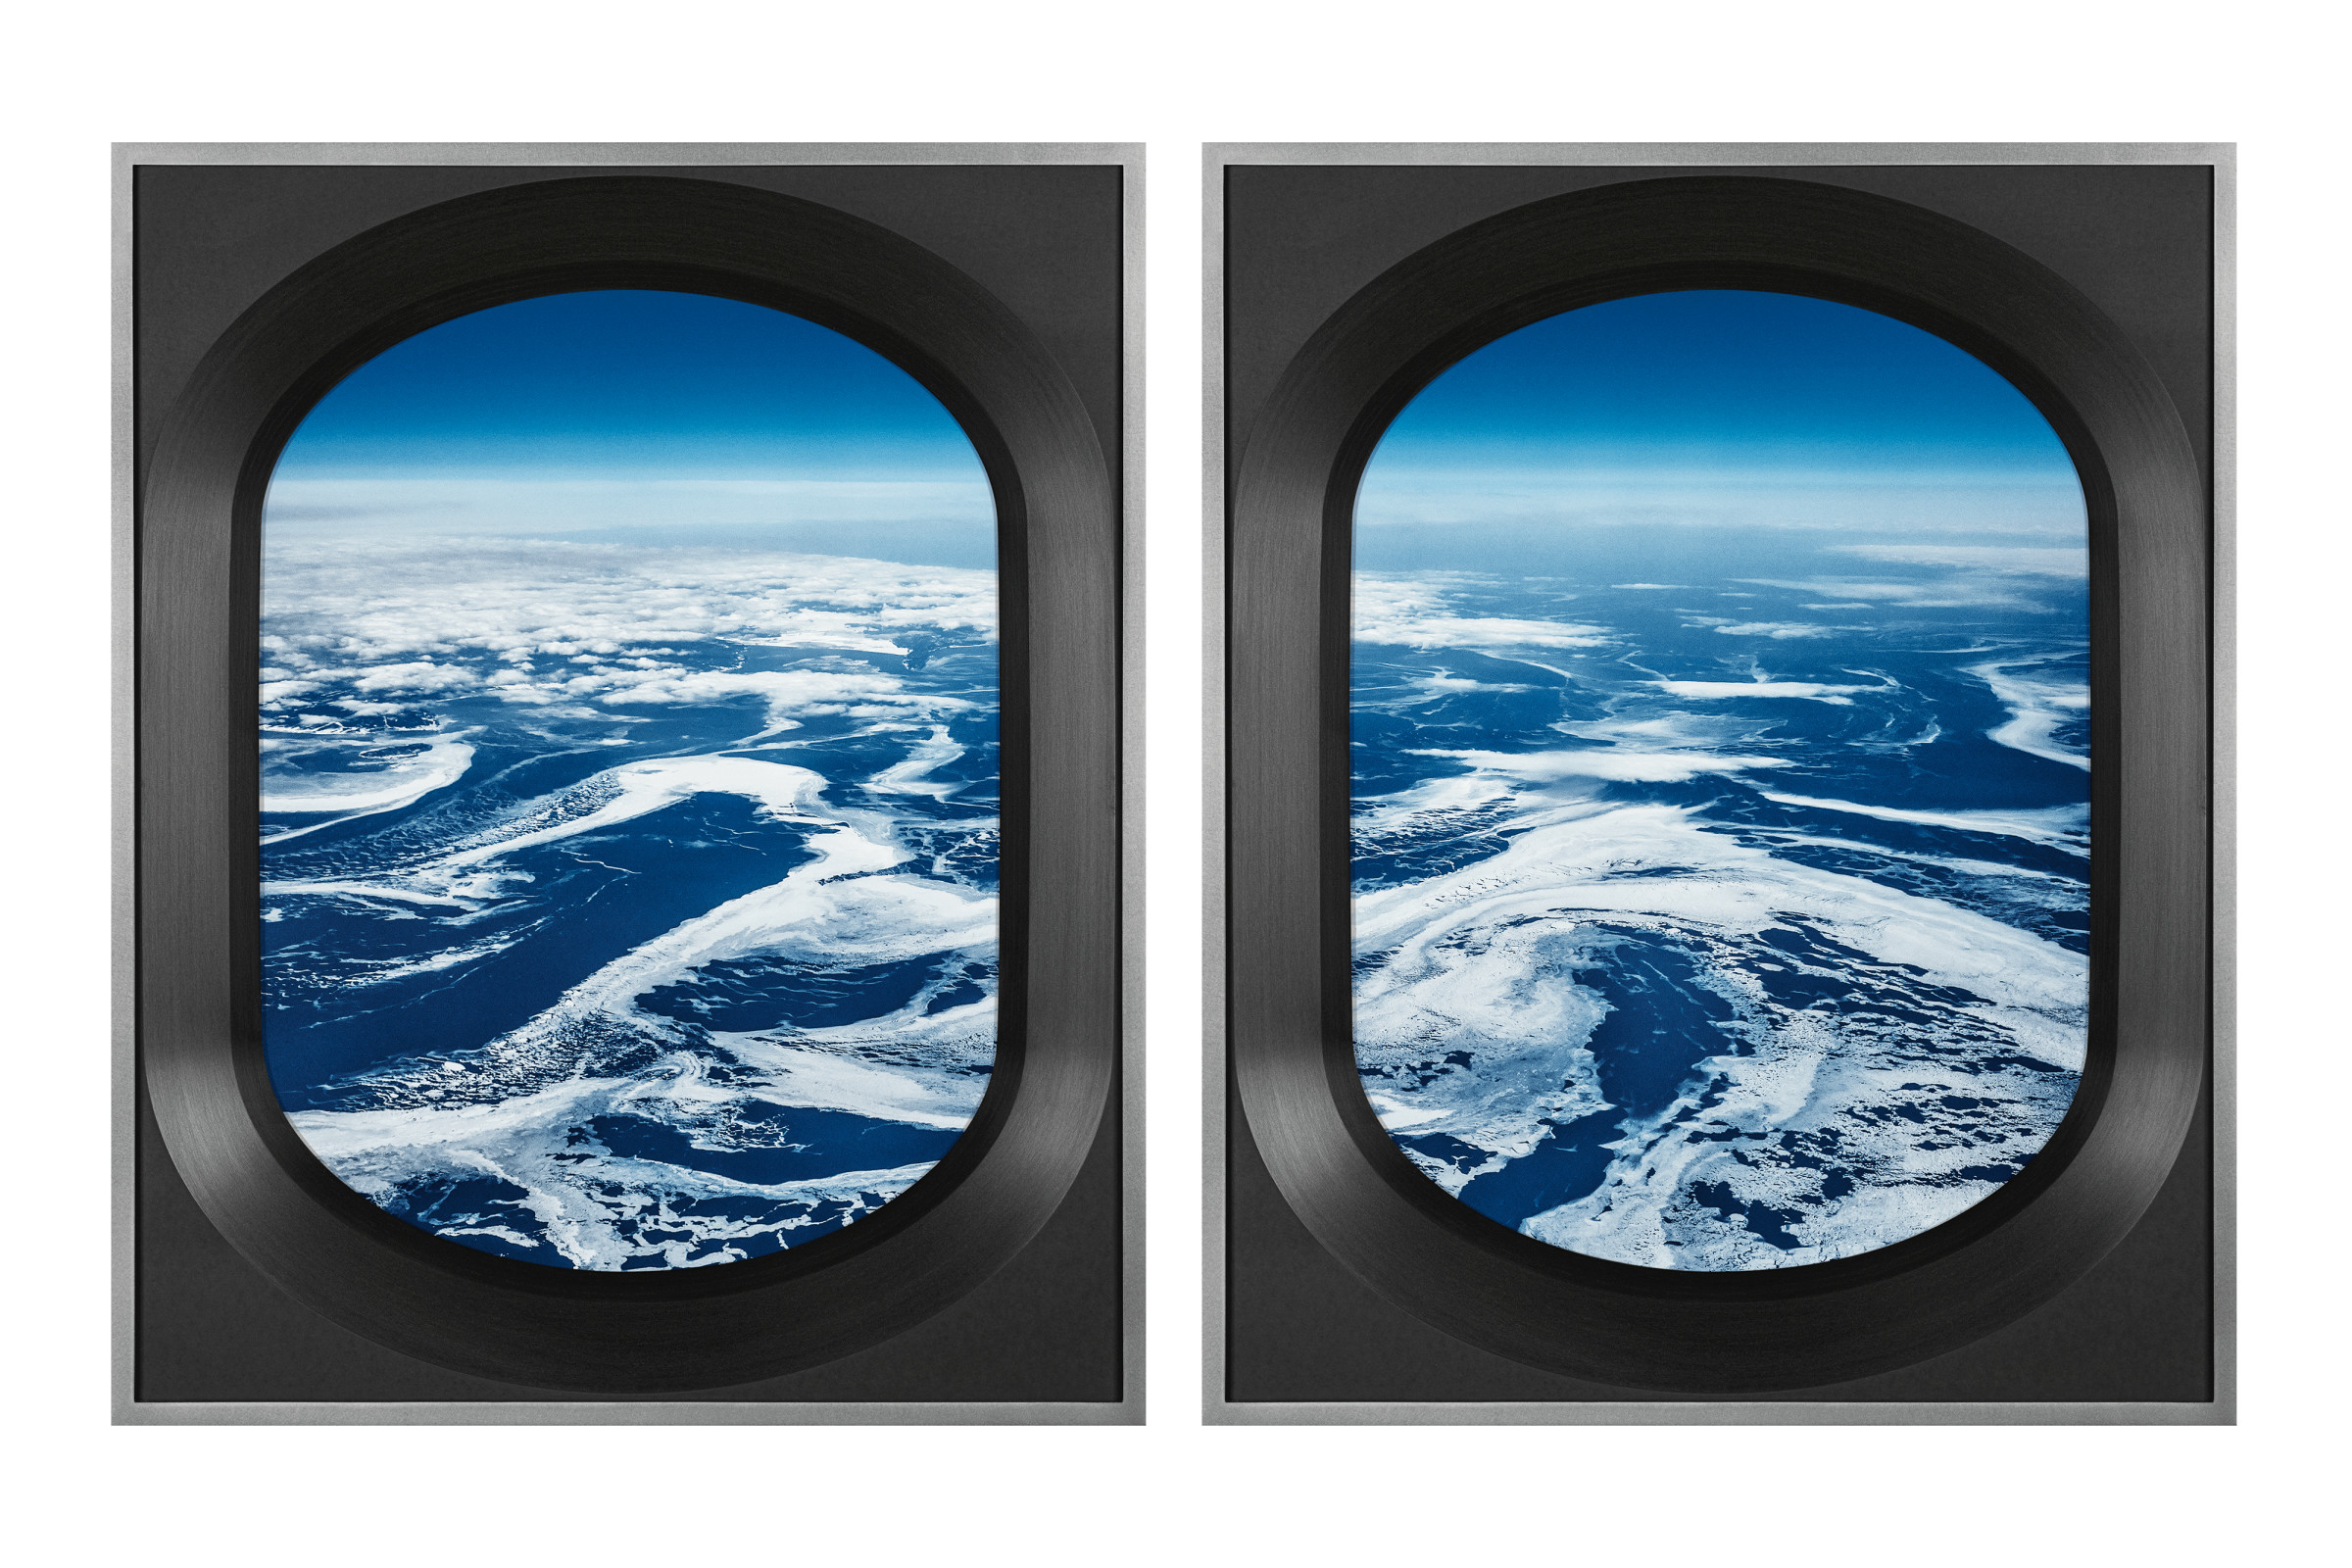 <span class=&#34;link fancybox-details-link&#34;><a href=&#34;/artworks/categories/1/1021/&#34;>View Detail Page</a></span><div class=&#34;artist&#34;><strong>Scott Mead</strong></div> <div class=&#34;title&#34;><em>LHR-BOS  03/29/2014  16:52:35</em></div> <div class=&#34;medium&#34;>Fujiflex super high gloss archival C-type print</div> <div class=&#34;edition_details&#34;></div><div class=&#34;description2&#34;>Sea ice and tidal patterns, far North Atlantic</div><div class=&#34;copyright_line&#34;> </div>